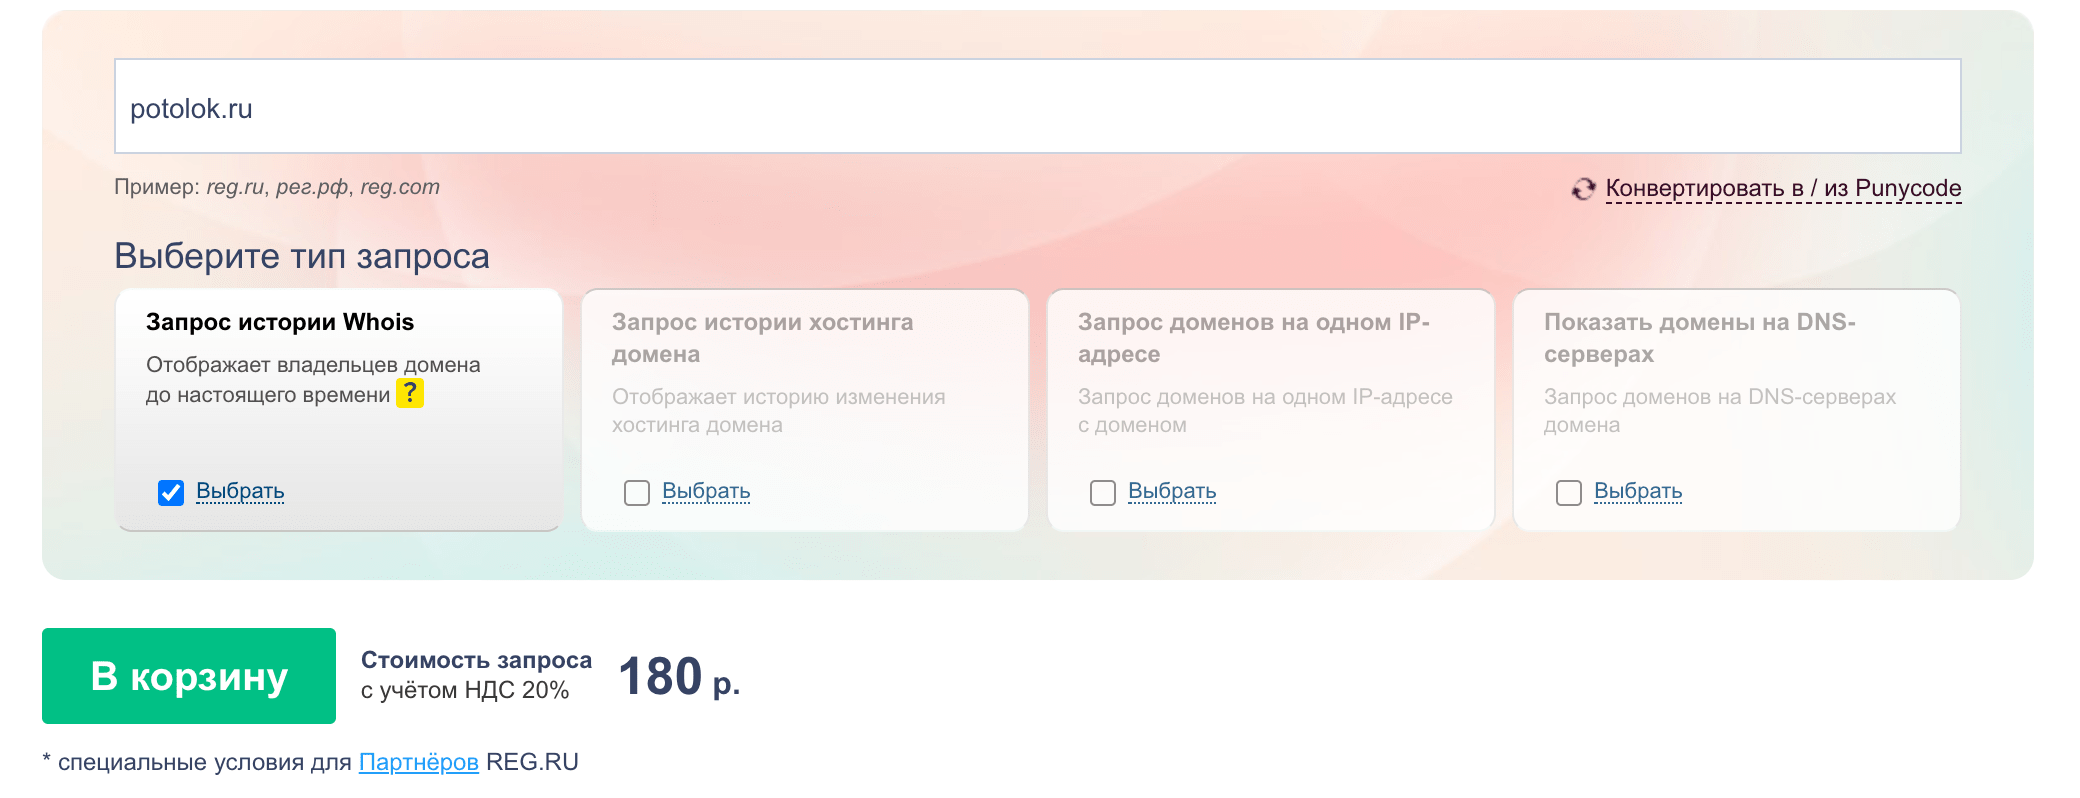 Проверка истории домена через сервис reg.ru